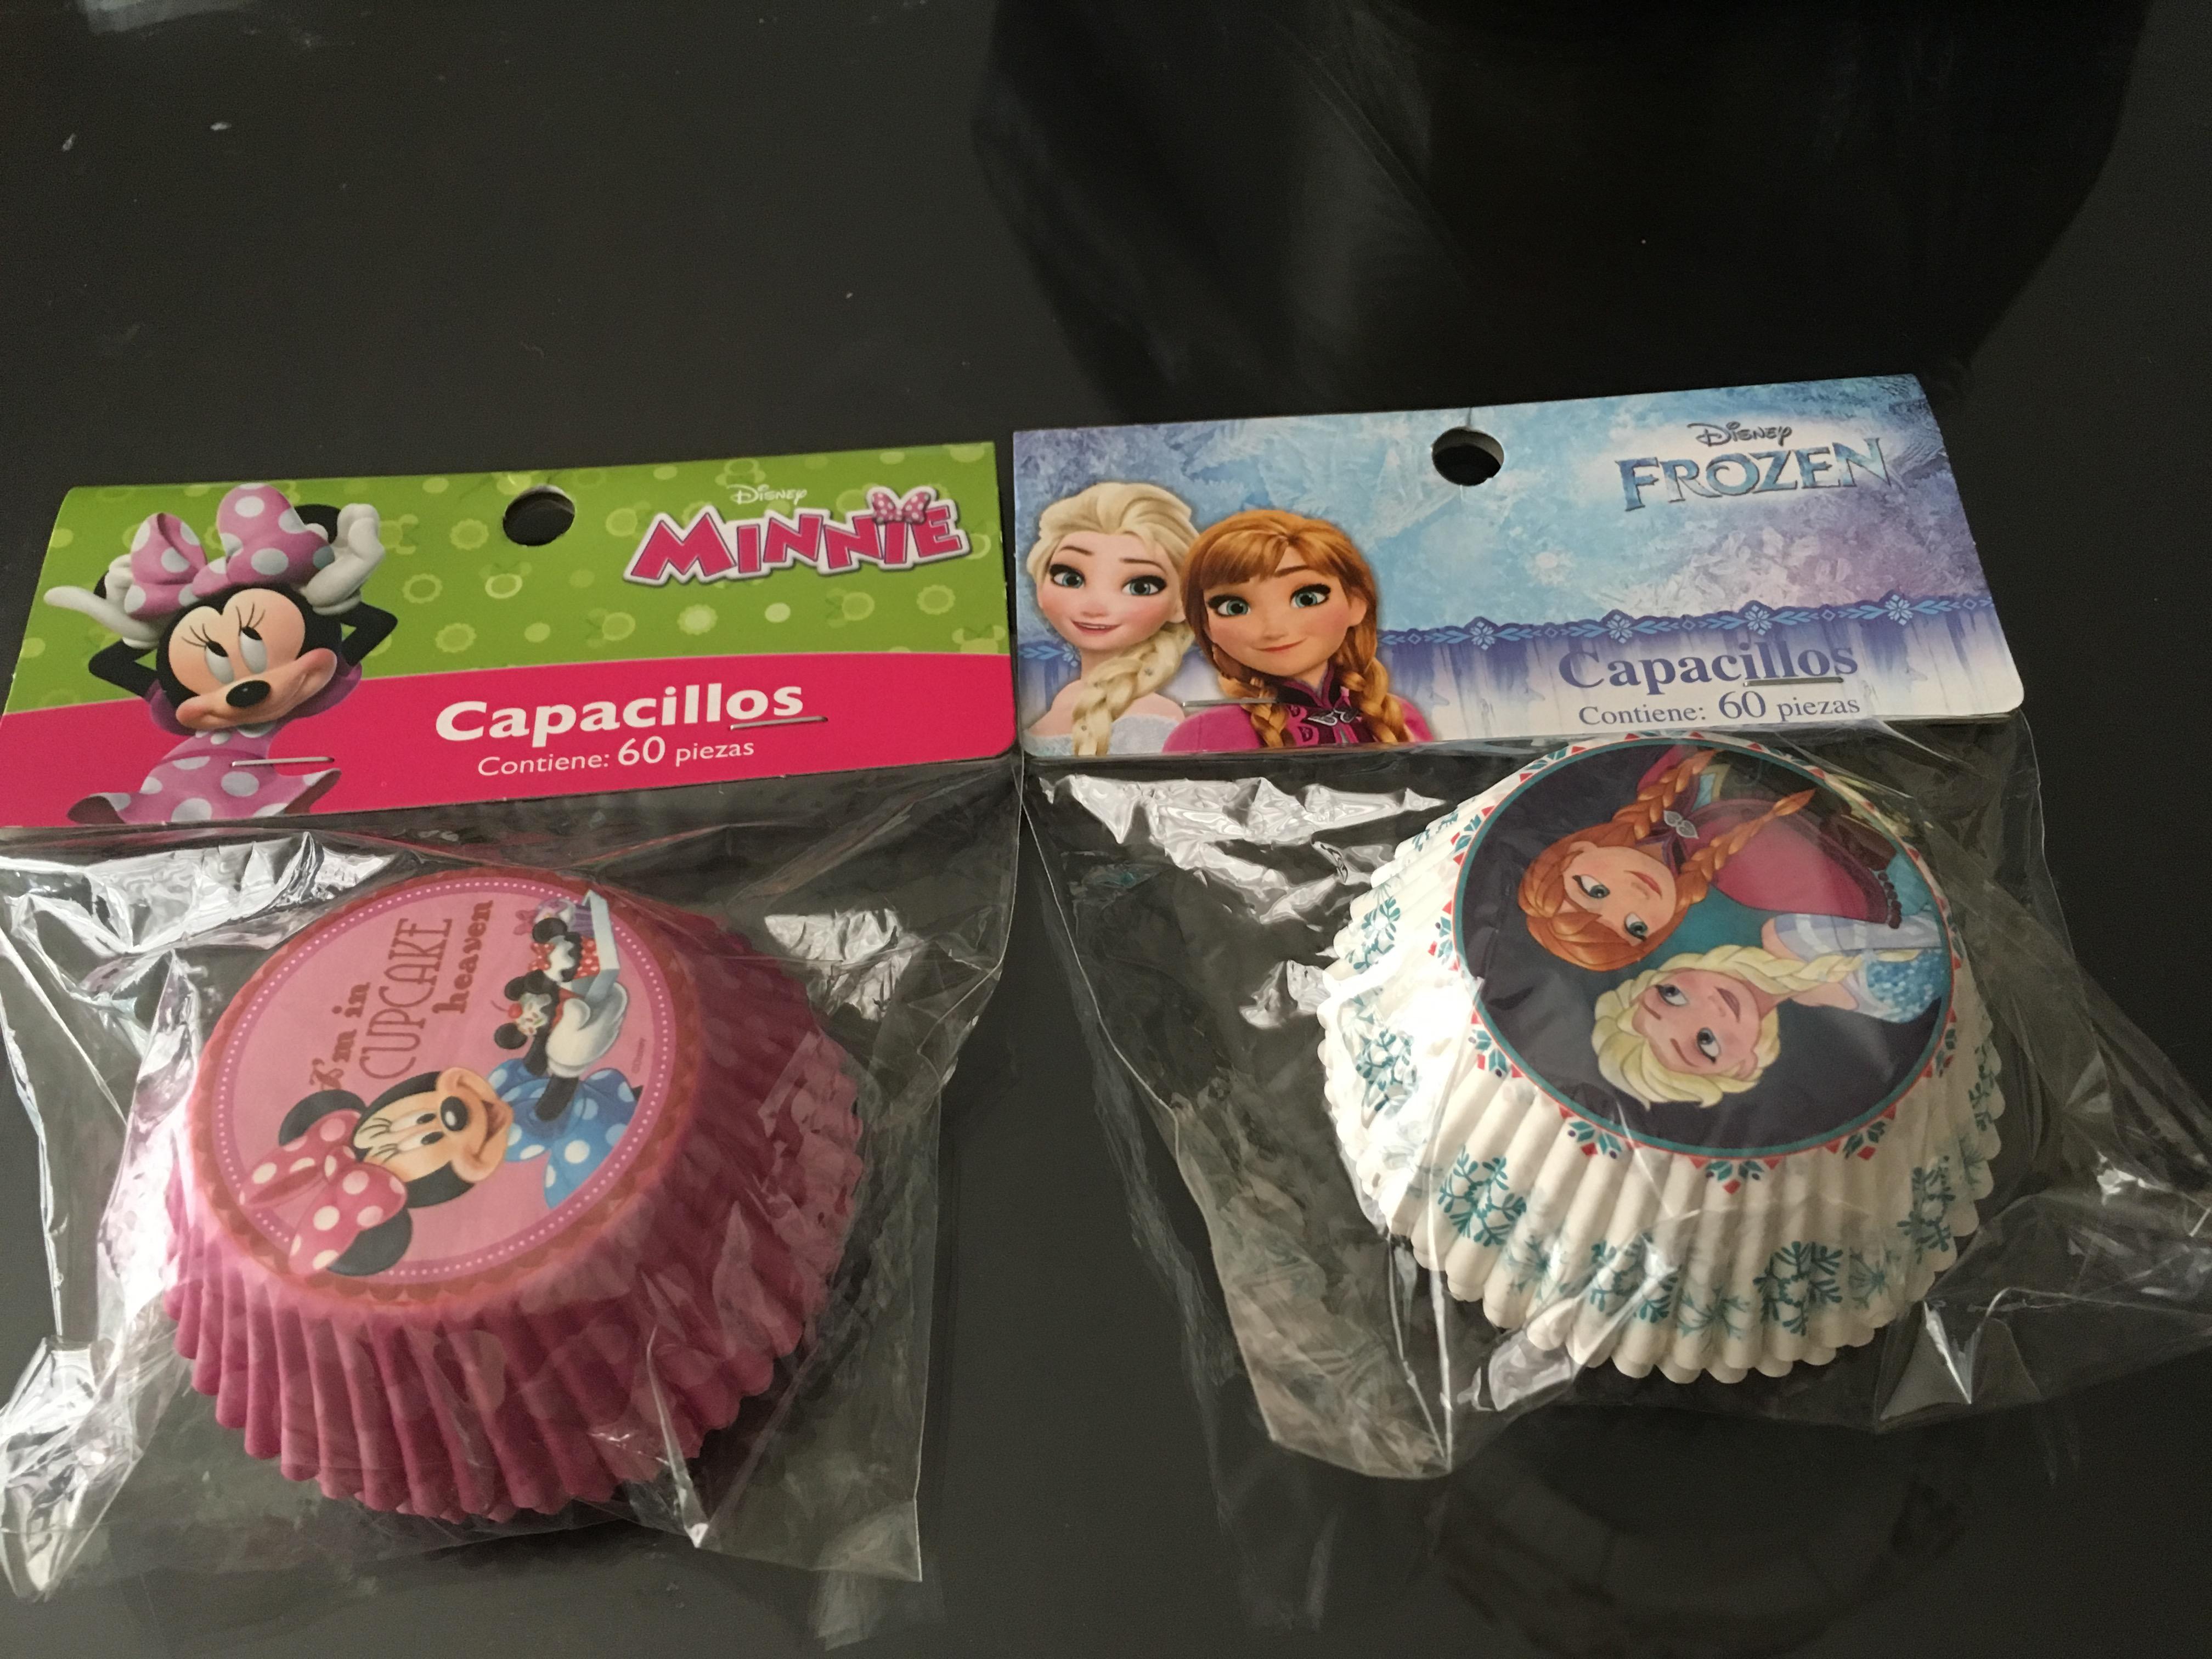 Walmart Toluca: 60 capacillos frozen/Minnie $1.03, botella Kitty $15.03 y Kit 4 tazones $12.01